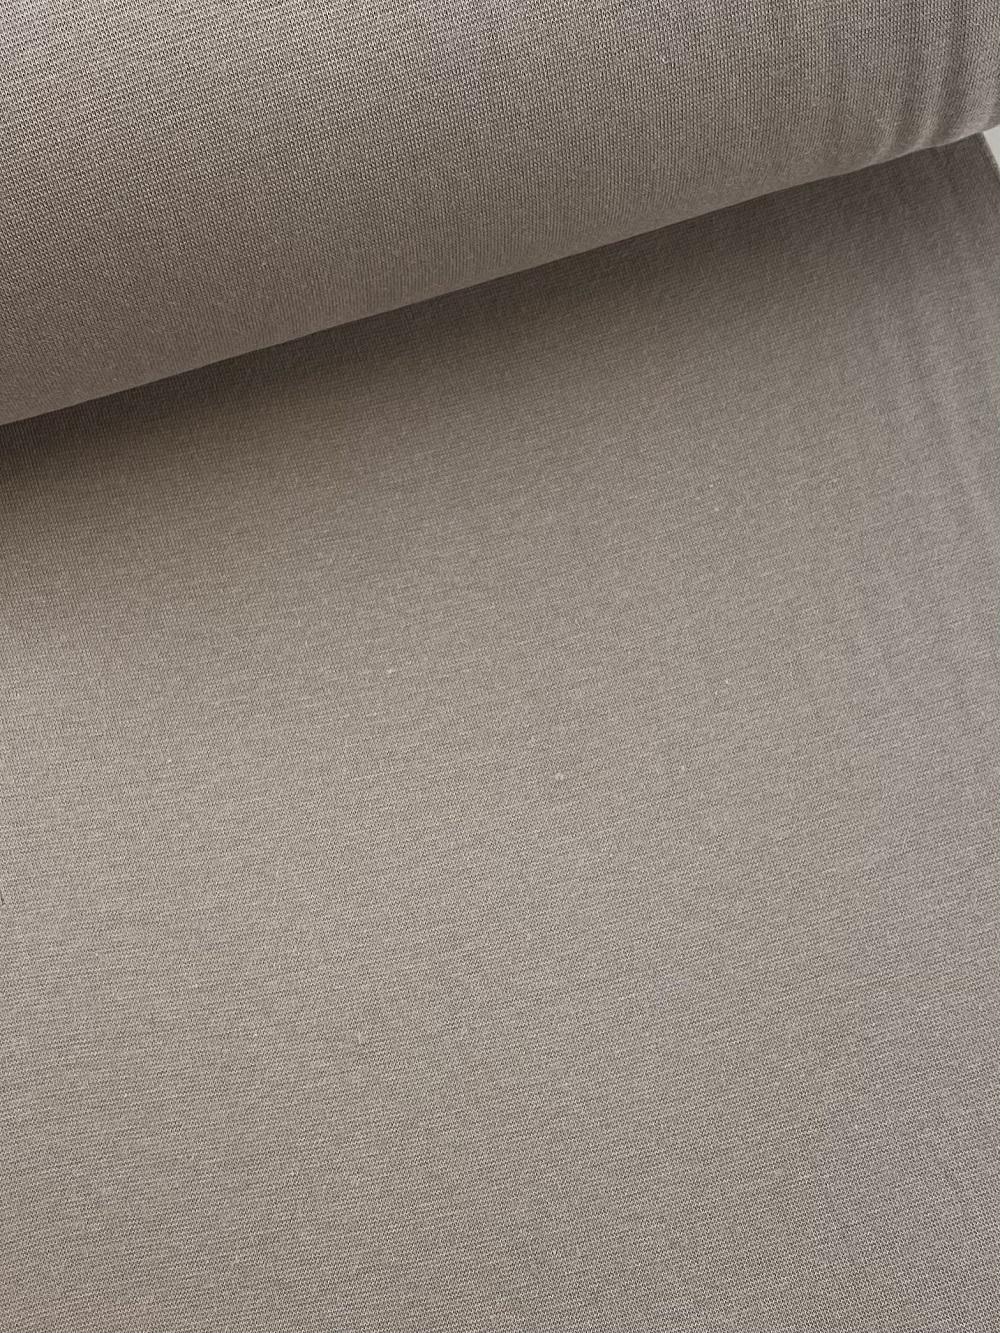 Bündchenware (glatt), dunkel beige. Art. SW10626